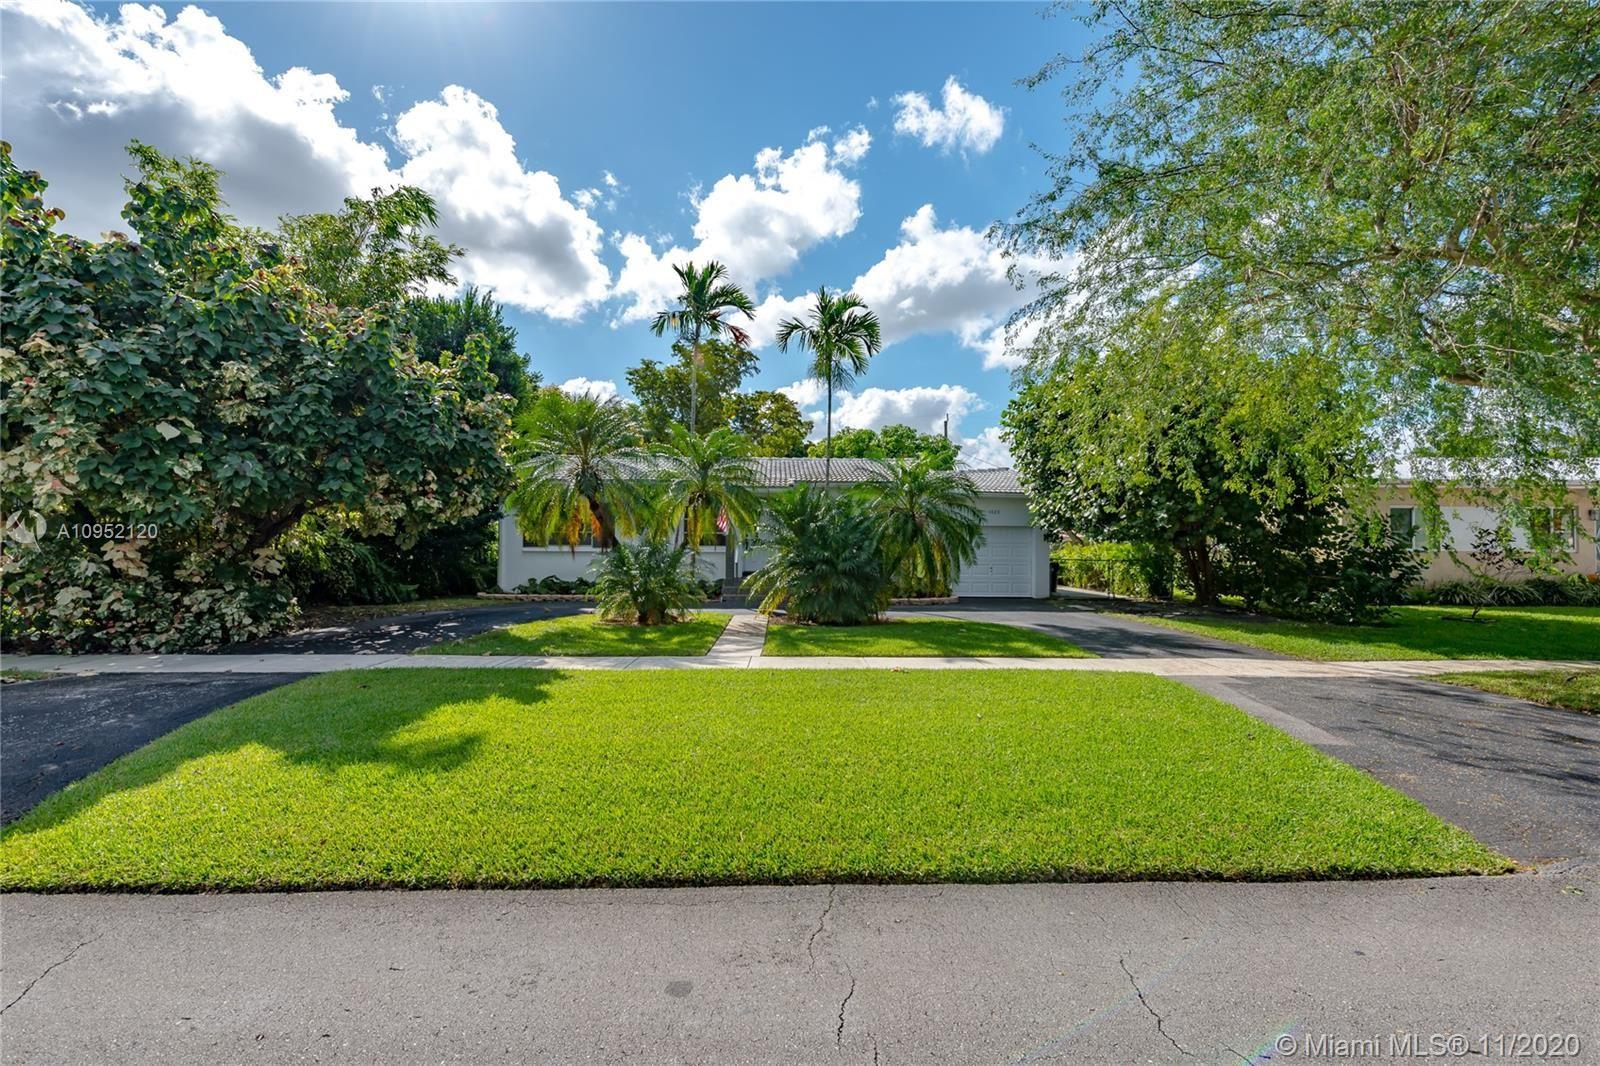 1020 Wren Ave, Miami Springs, FL 33166 - #: A10952120